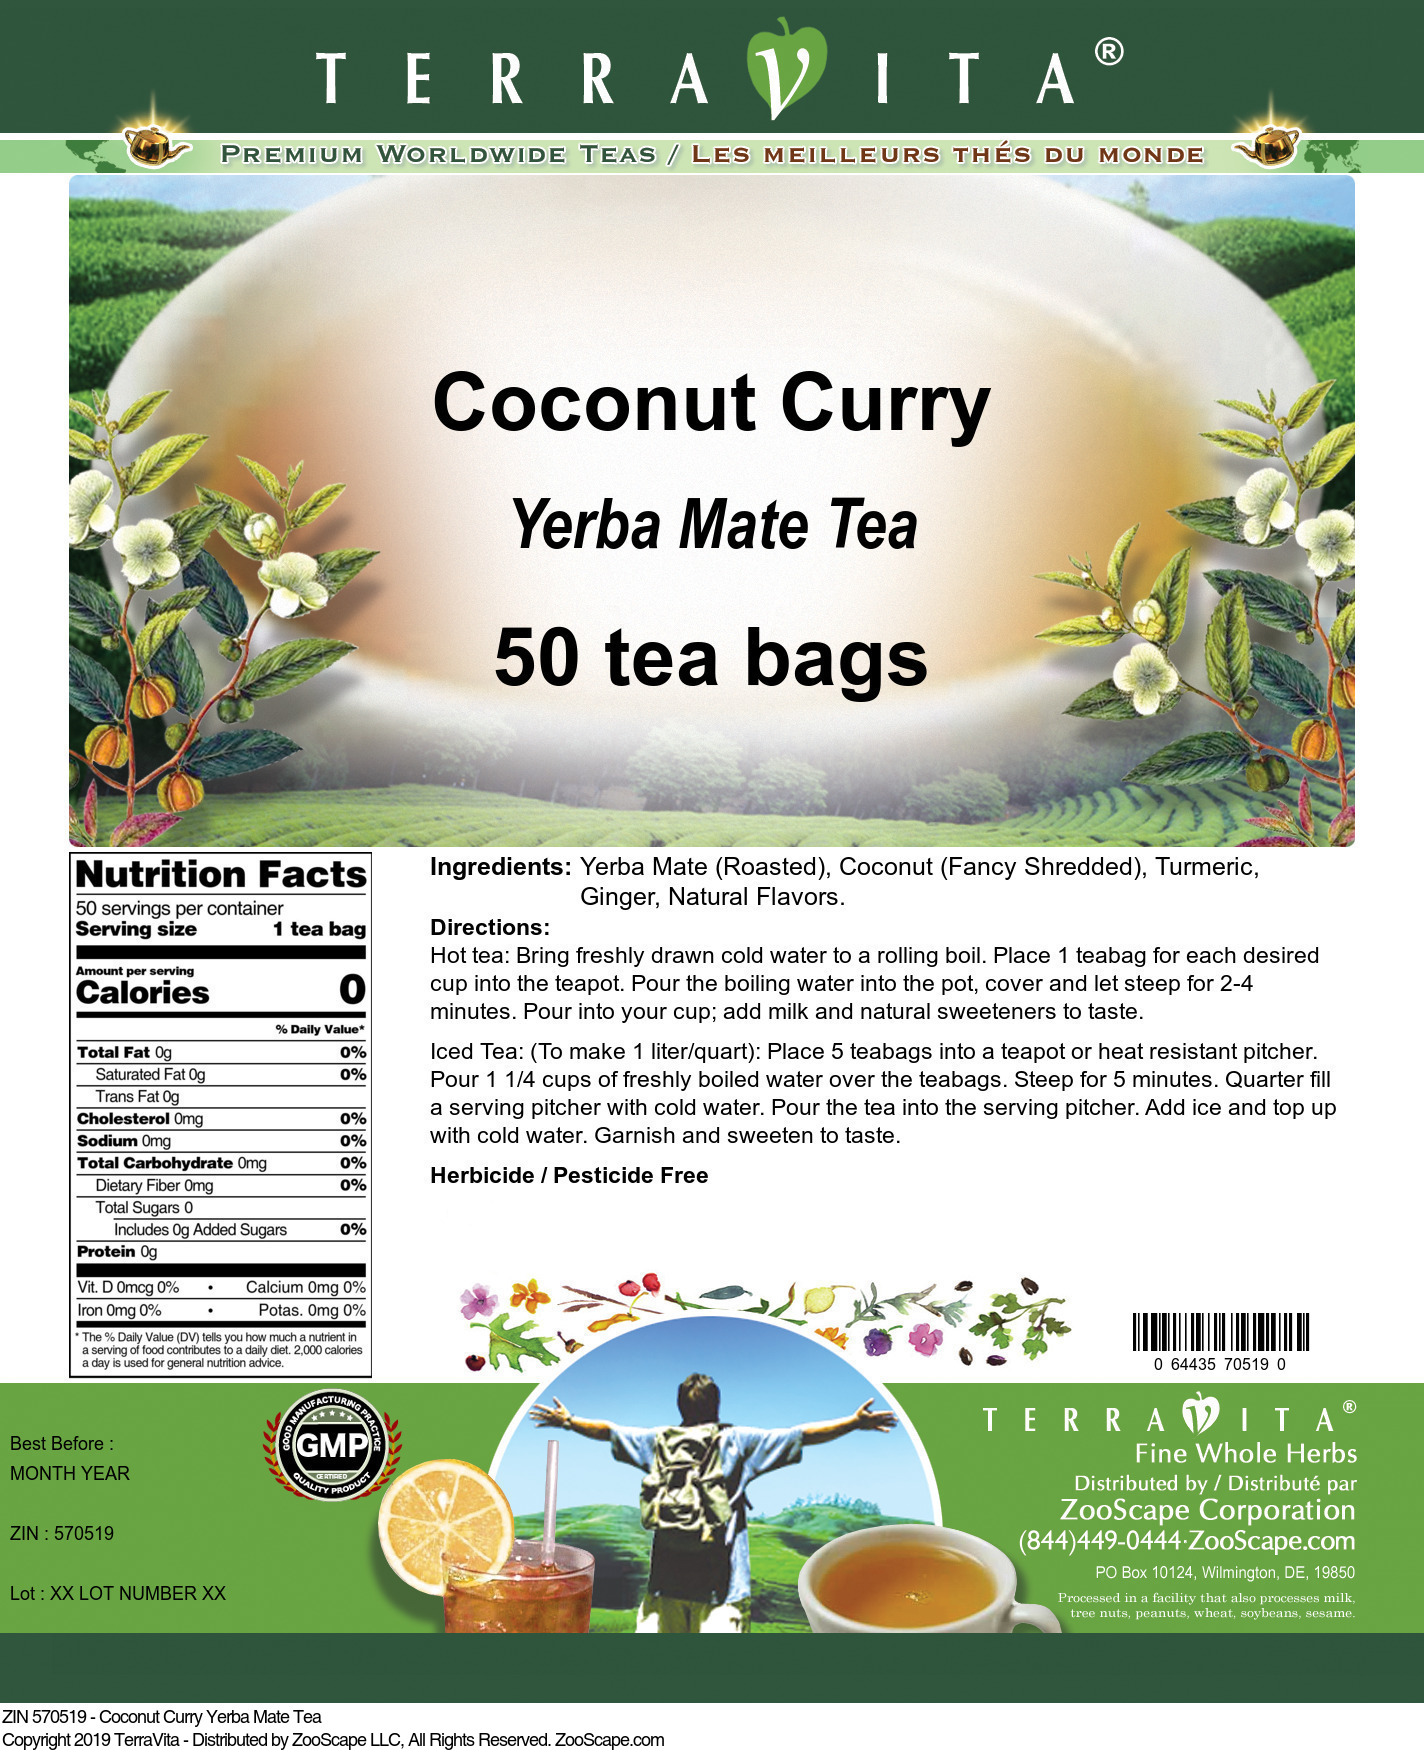 Coconut Curry Yerba Mate Tea